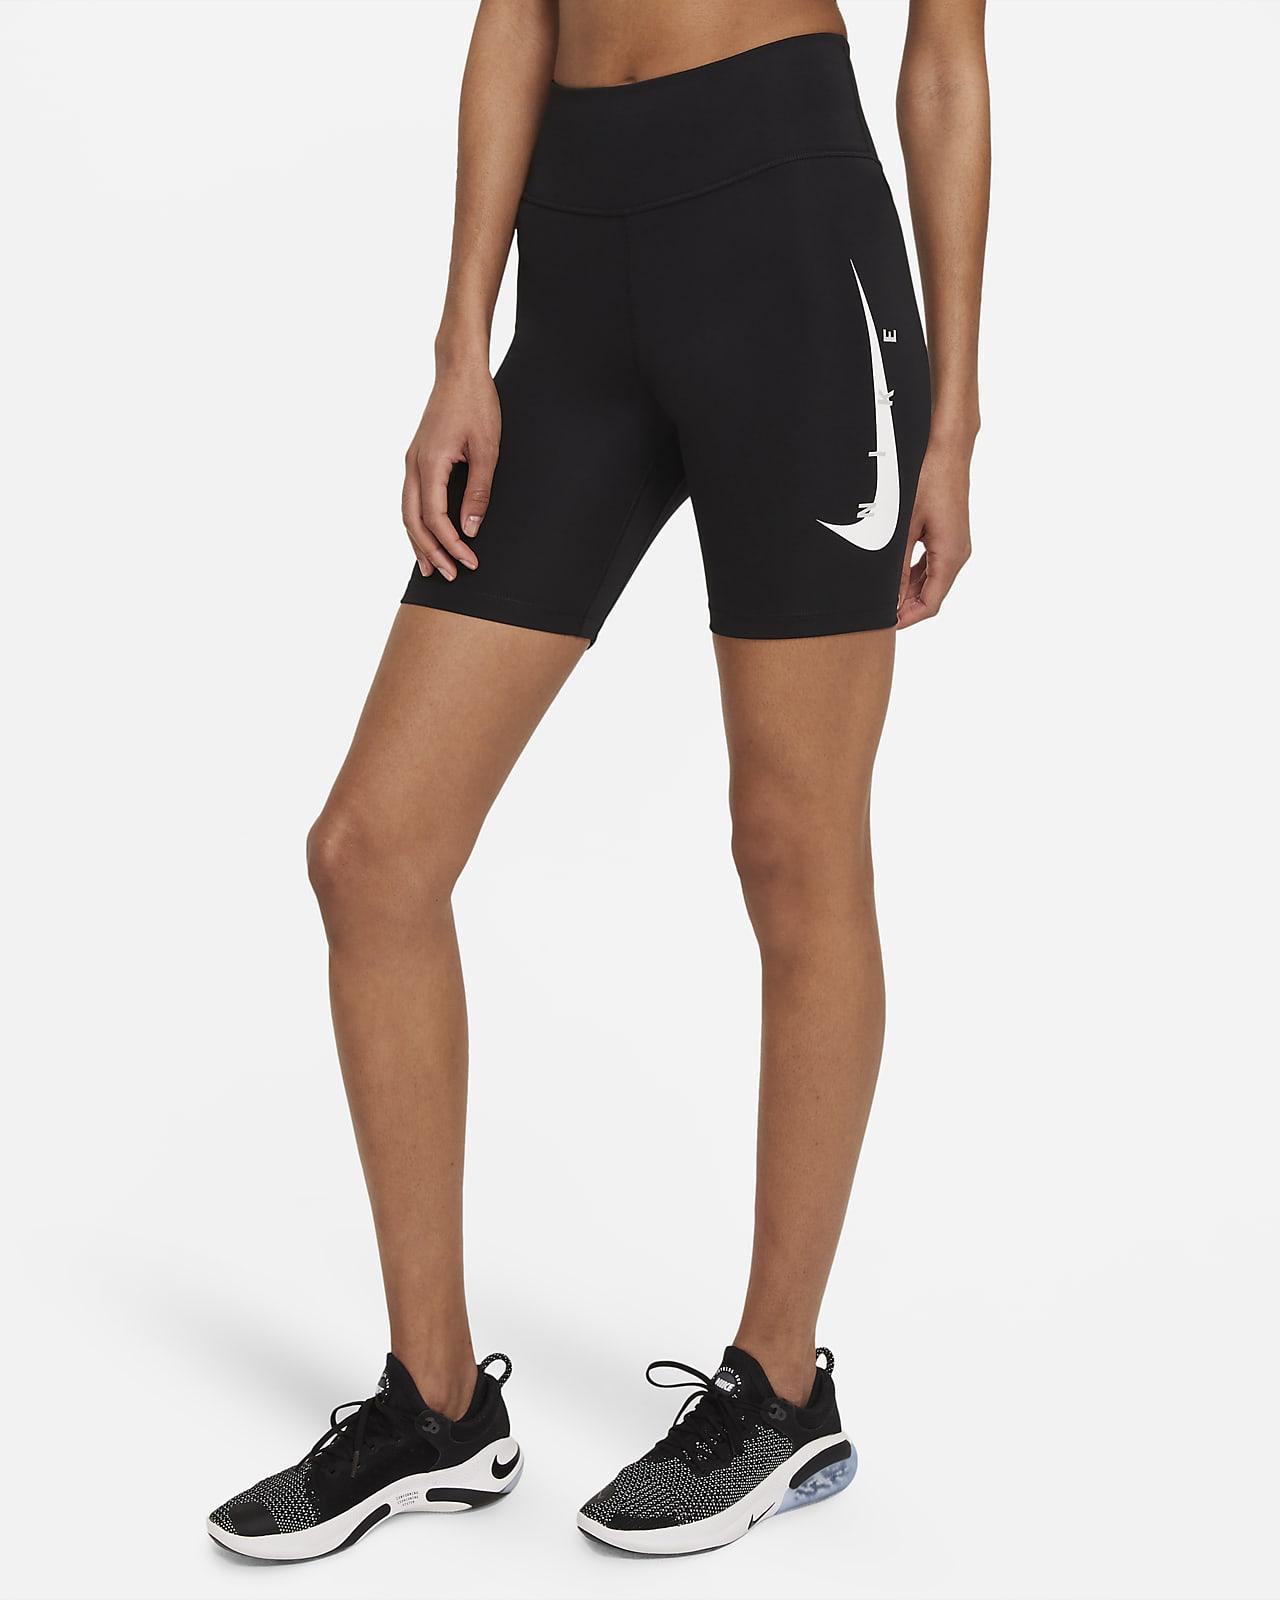 Nike Swoosh Run Women's 18cm (approx.) Running Leggings